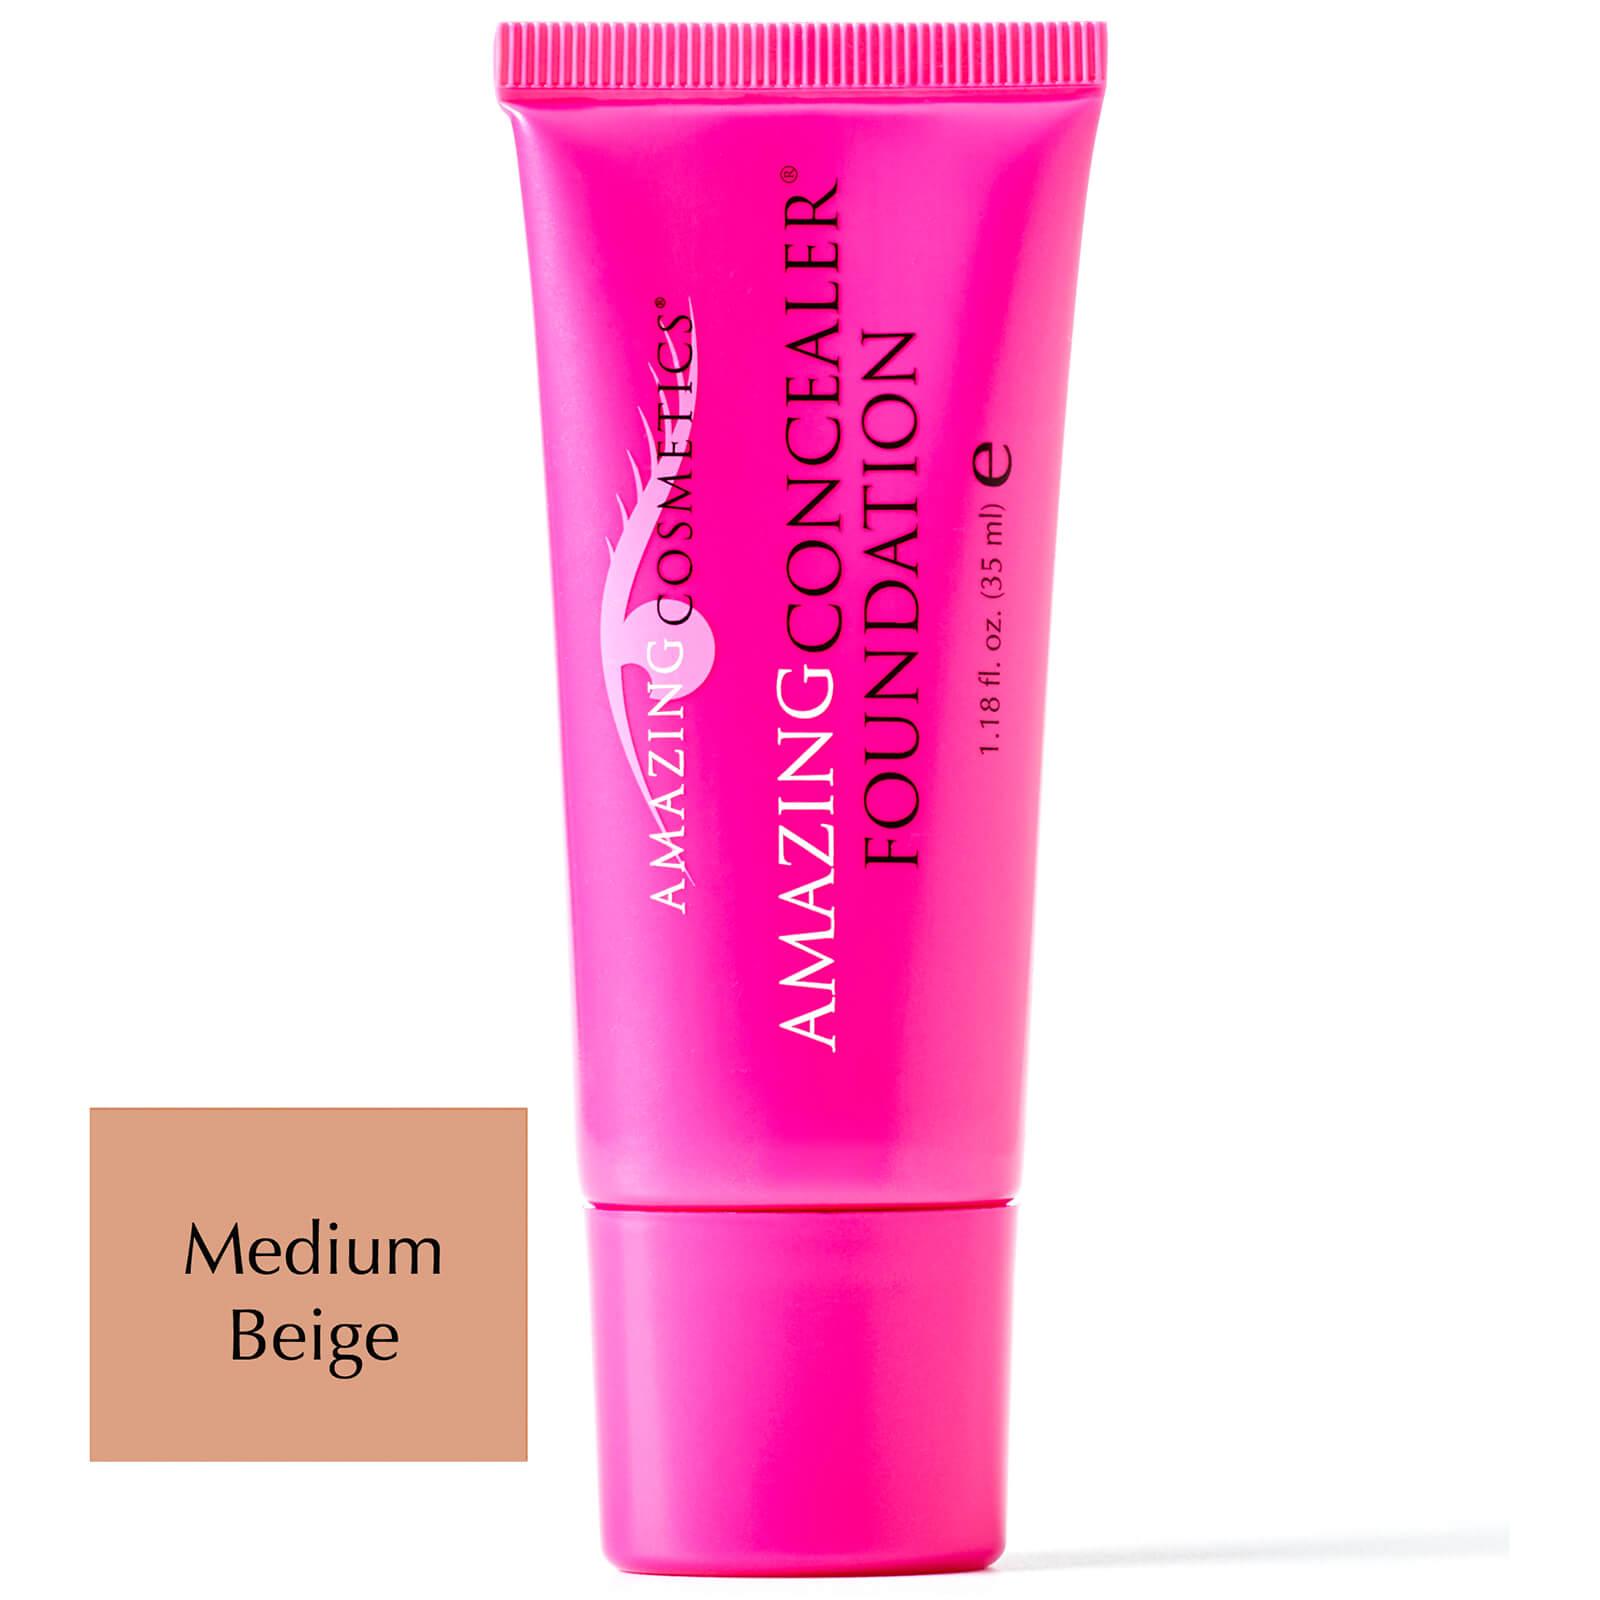 Amazing Cosmetics AmazingConcealer® FoundationdeAmazing Cosmetics35ml -Différentes teintes - Medium Beige